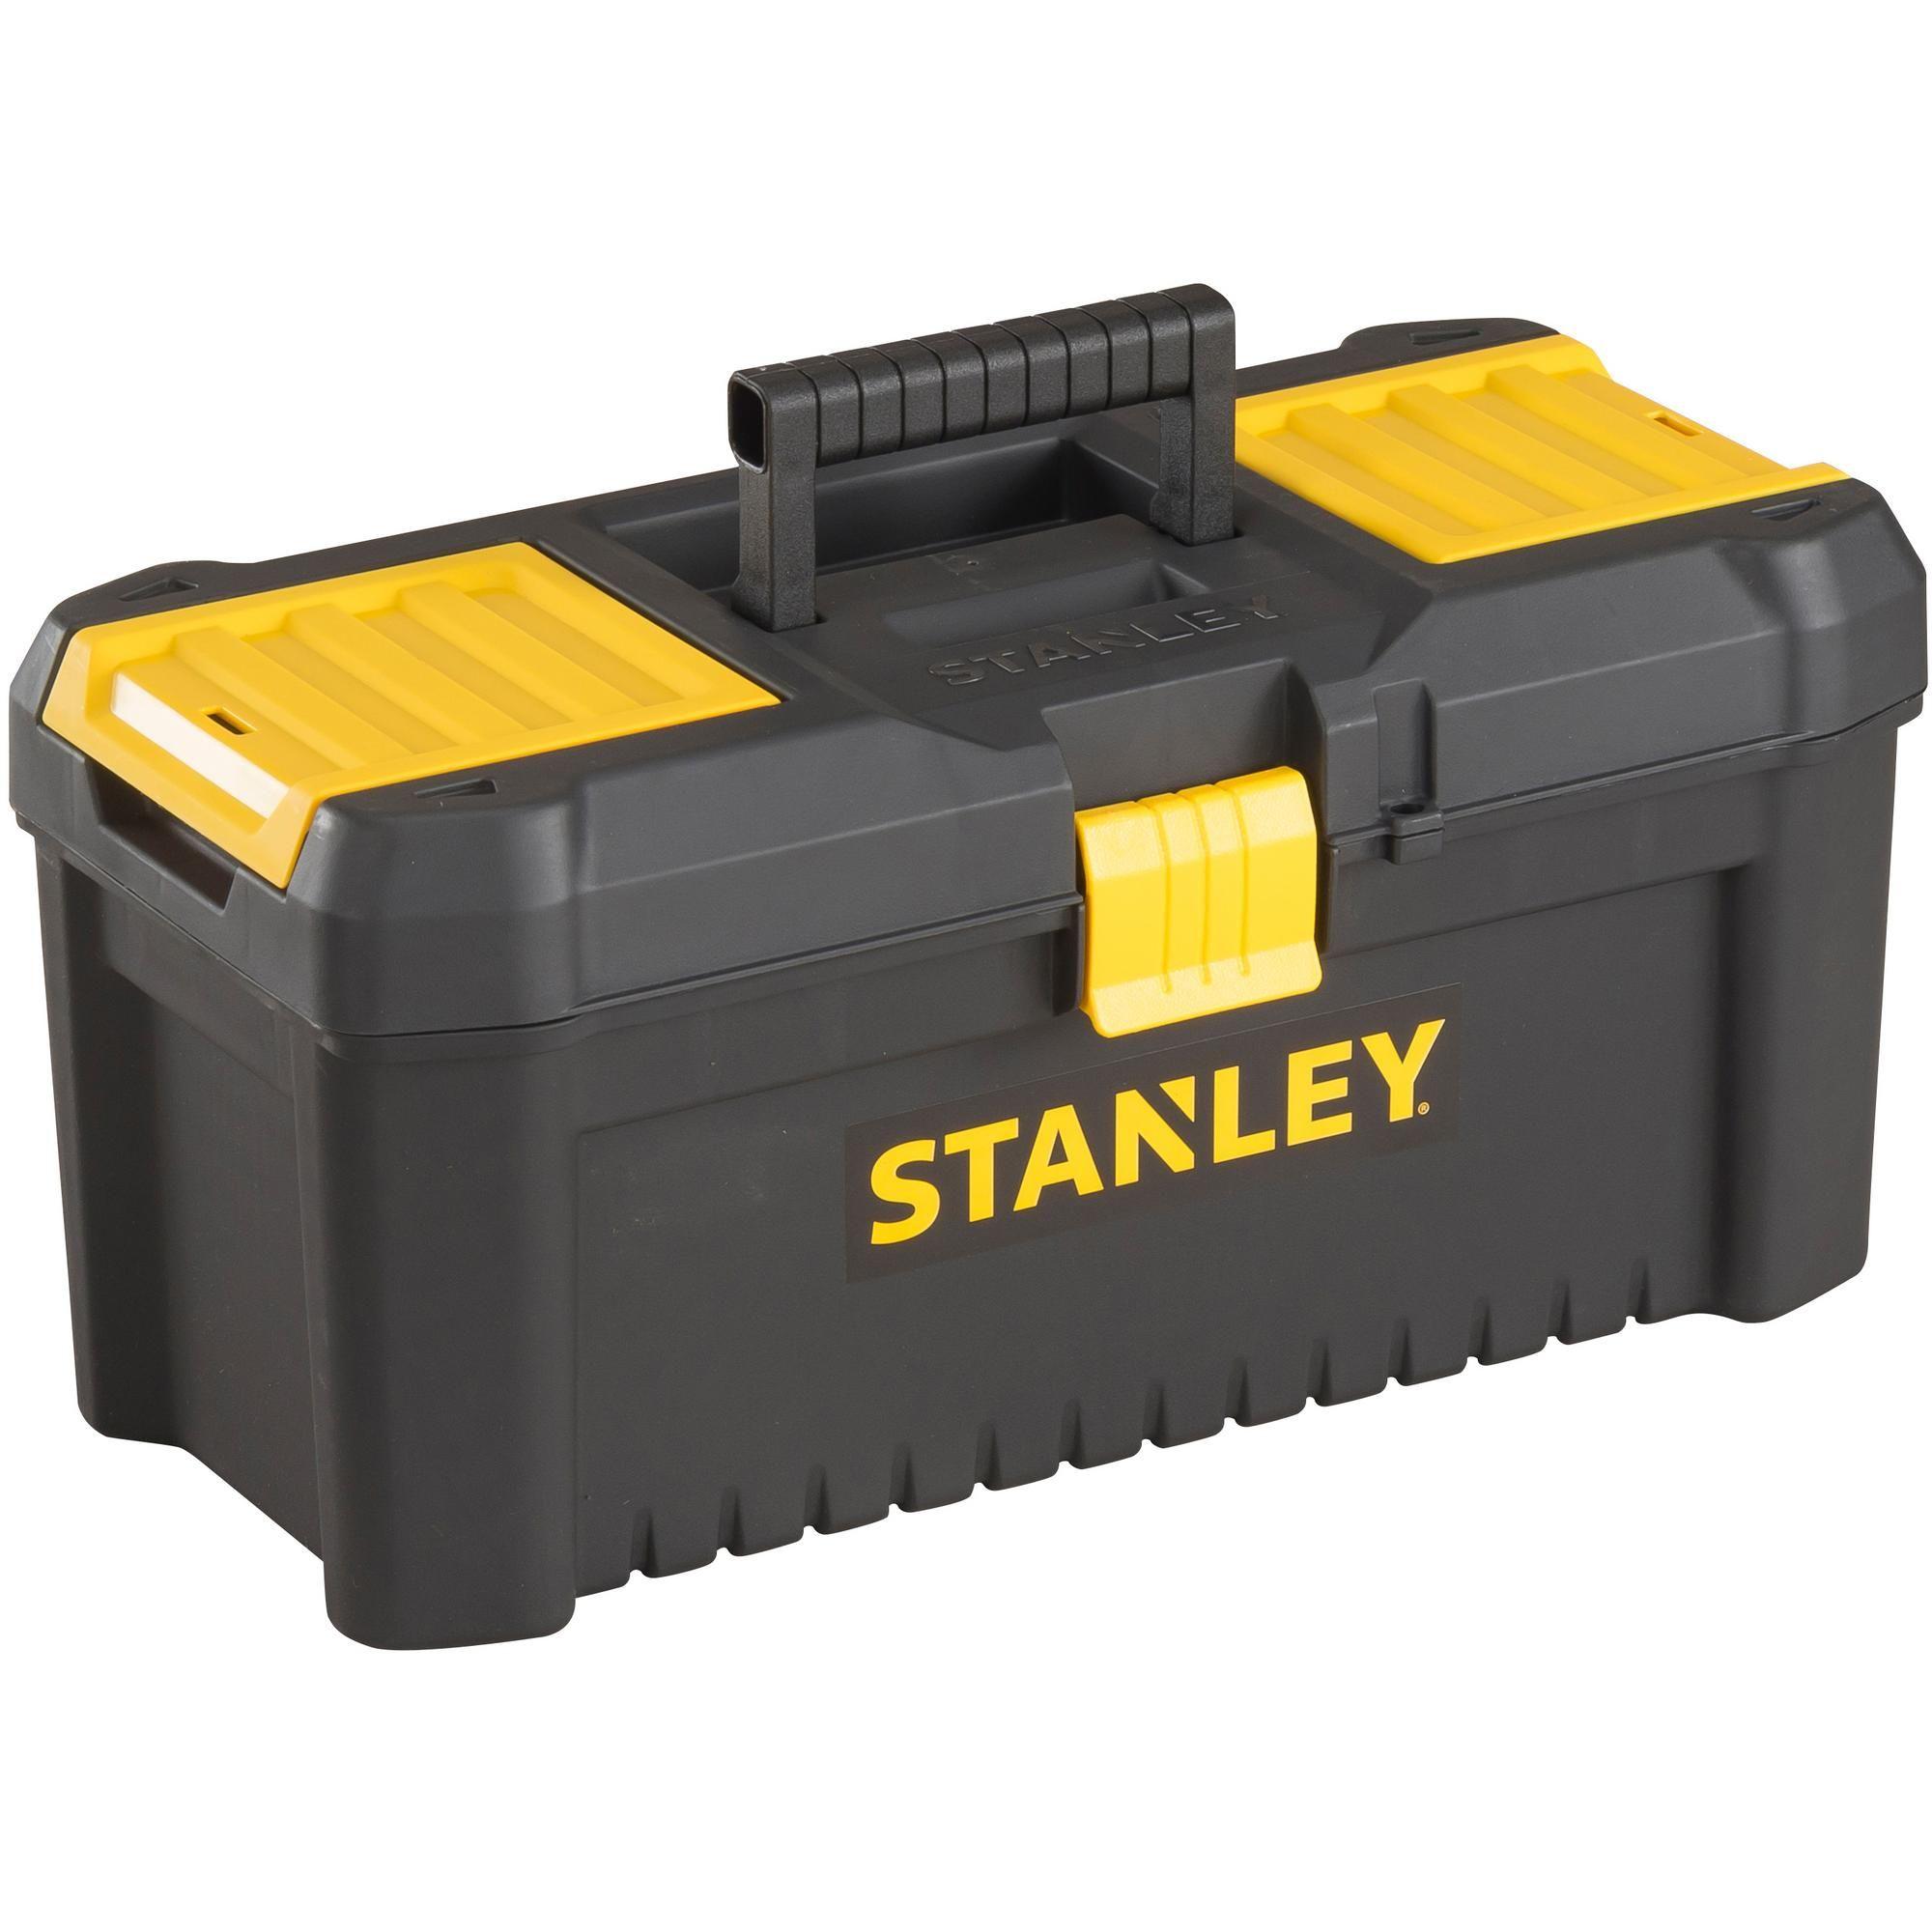 "Stanley 12.5"" Tool Box £4 @ Halfords eBay. Free C&C"